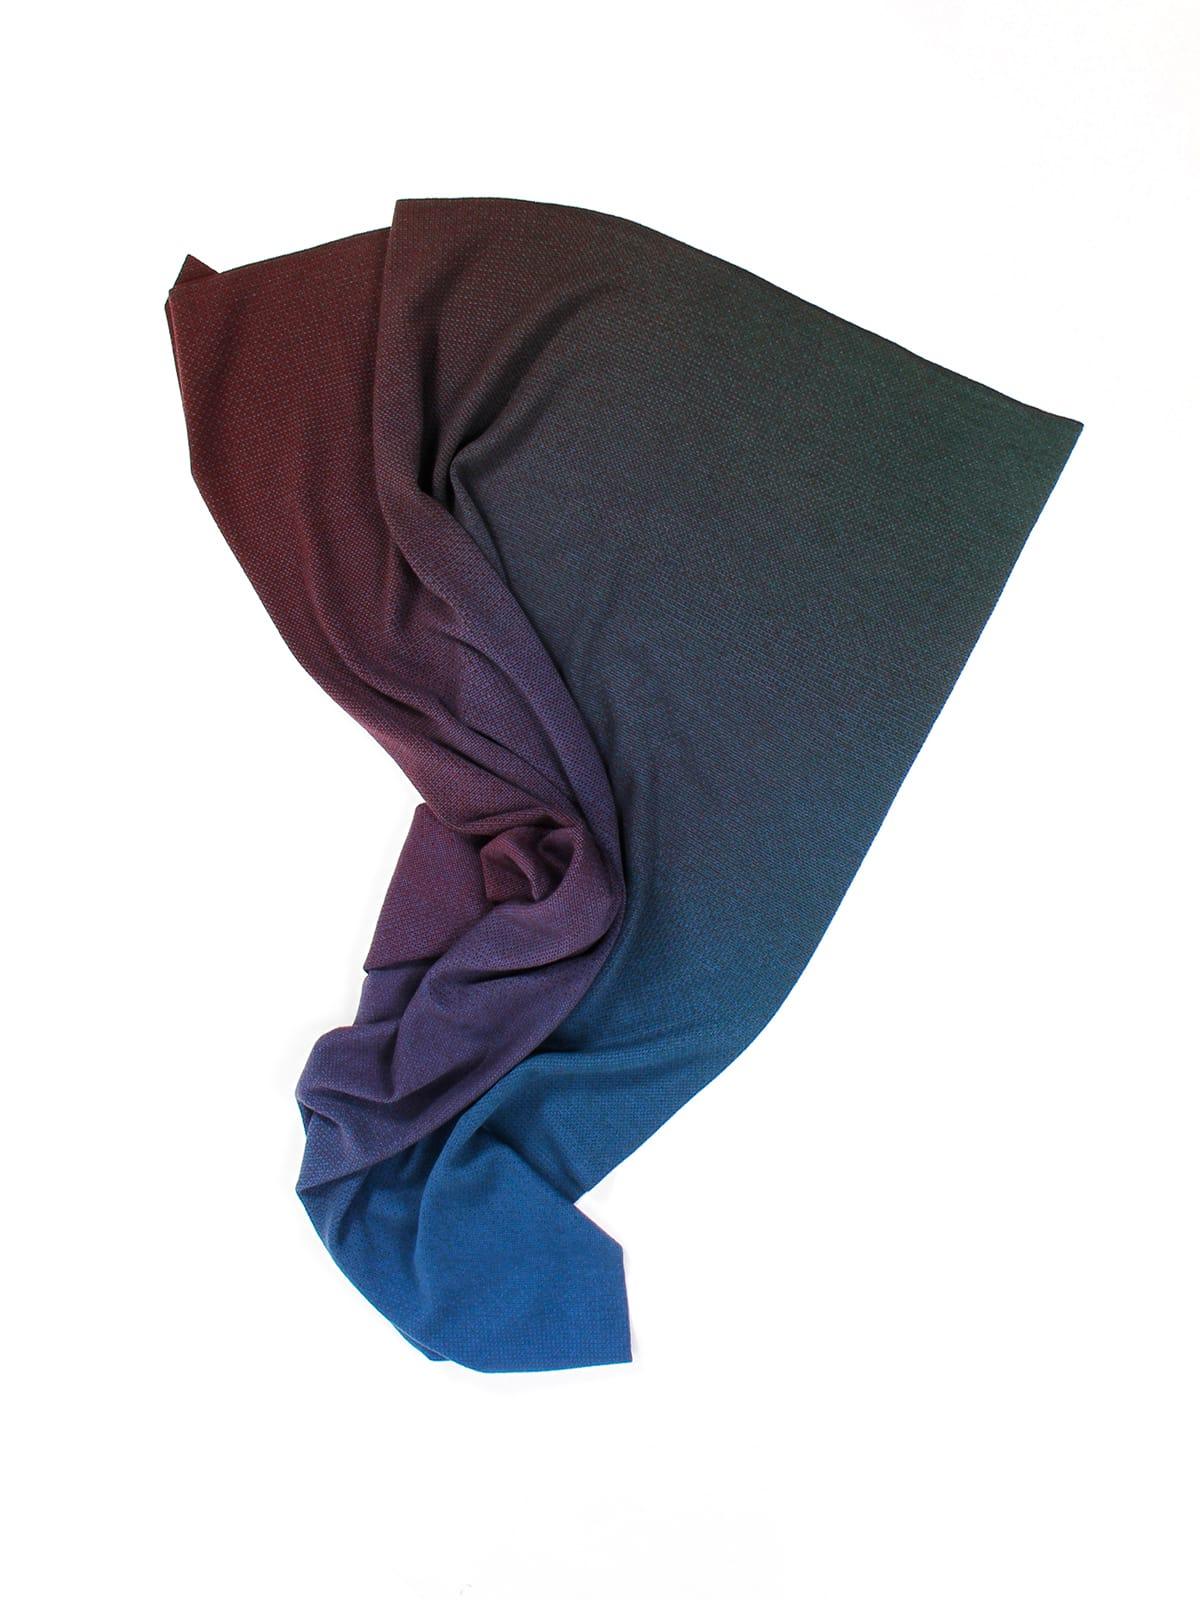 Knitted Blanket Venice - Merino Wool draped